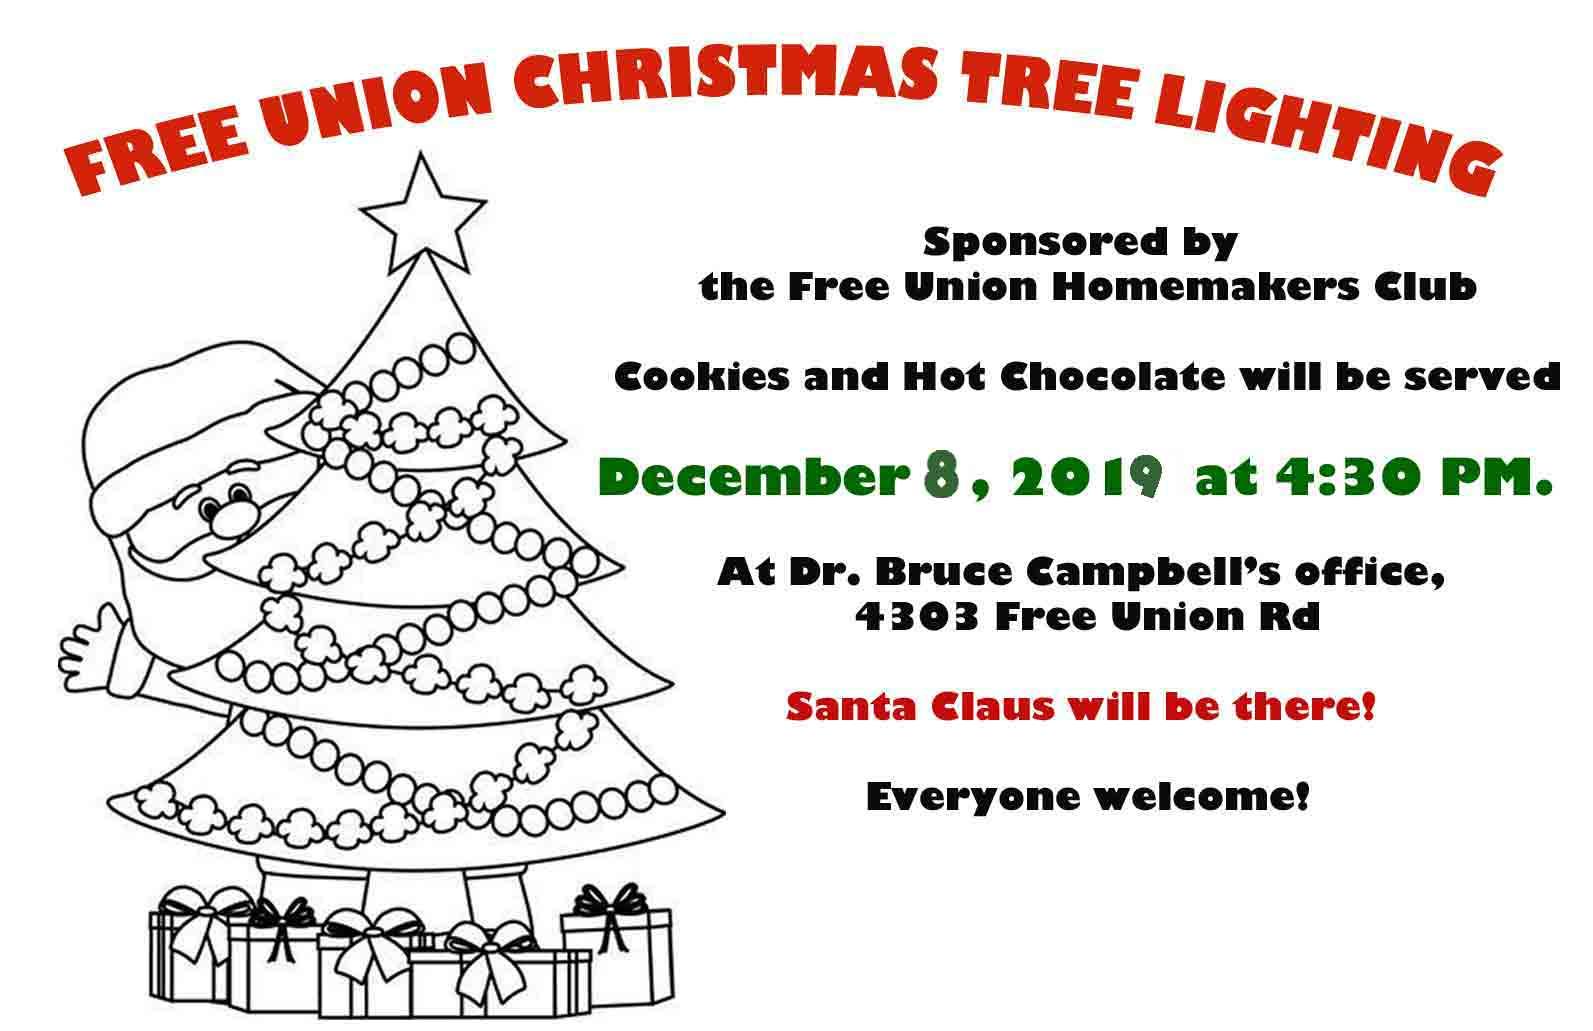 Free Union Christmas Tree Lighting